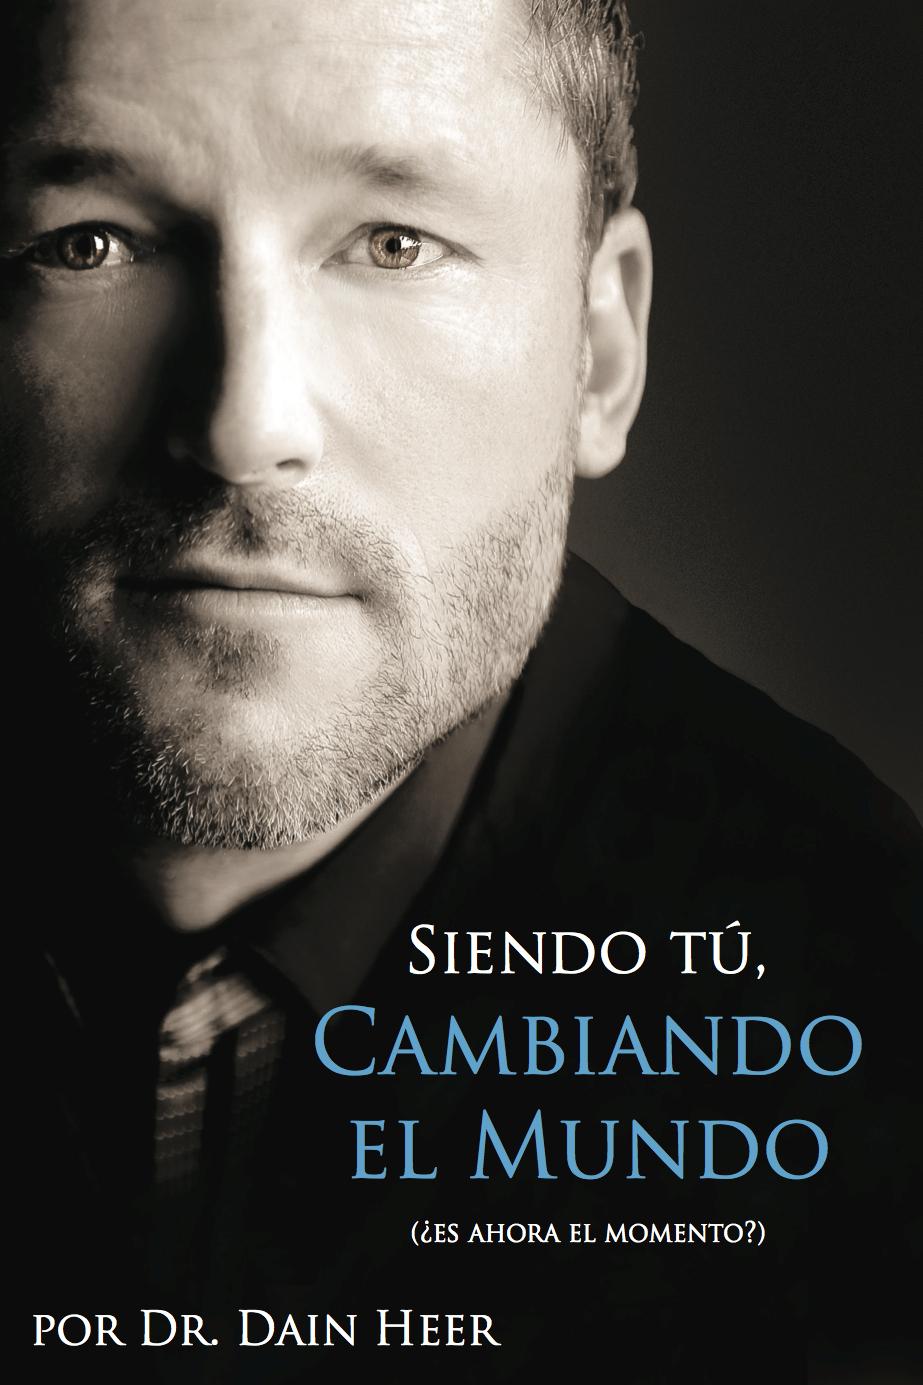 Siendo Tu, Cambiando El Mundo (Being You, Changing the World Spanish)